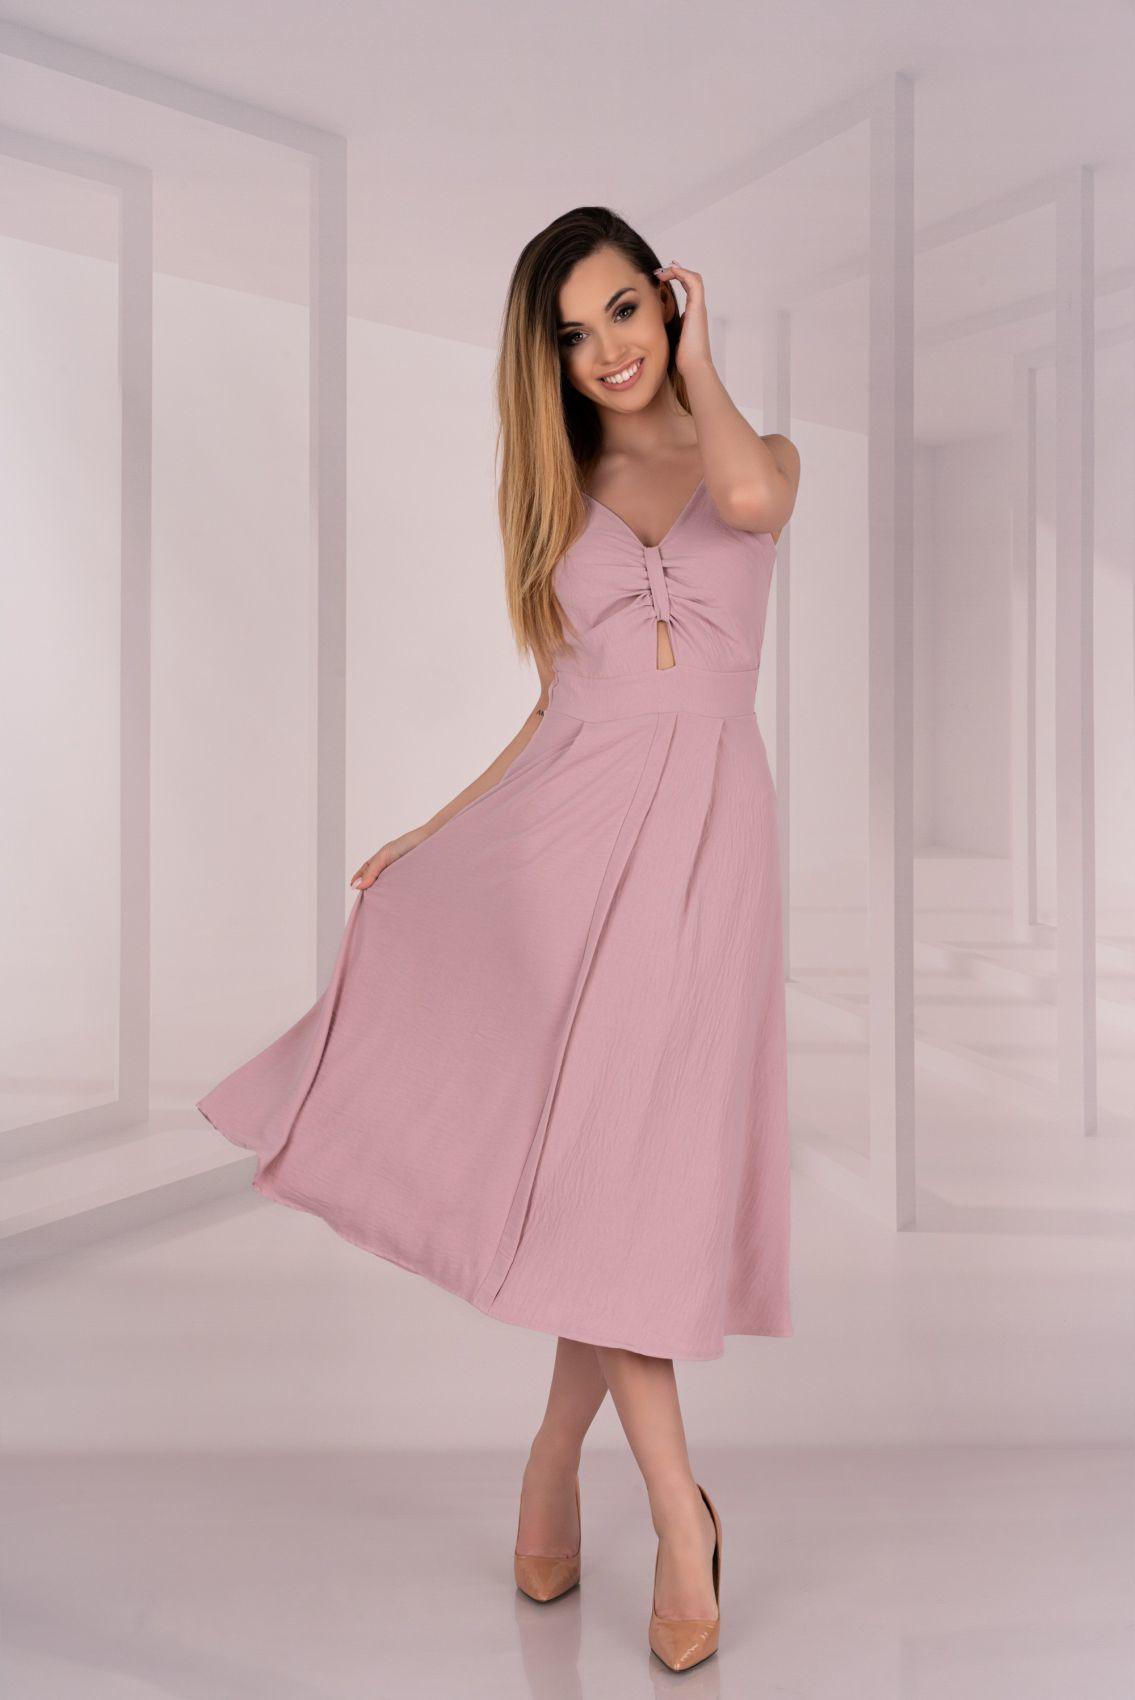 Molinen Powder D04 sukienka